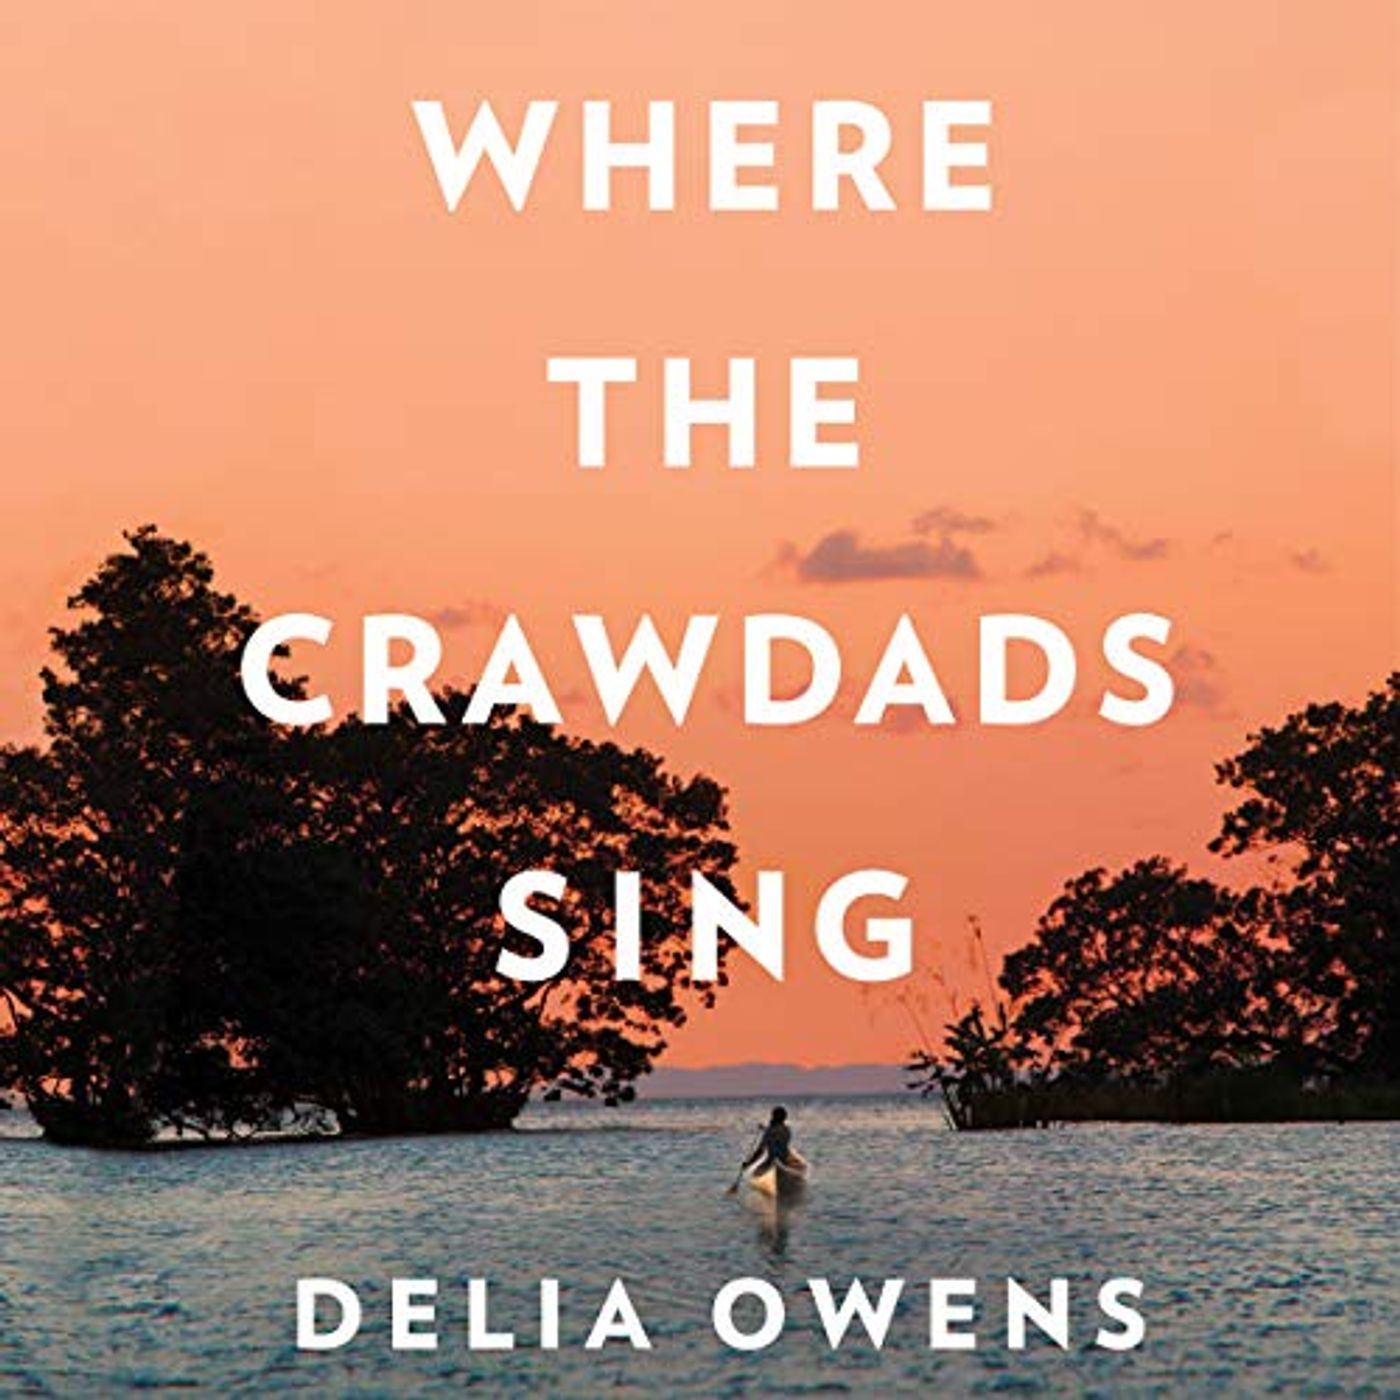 Book Club: Where the Crawdads Sing